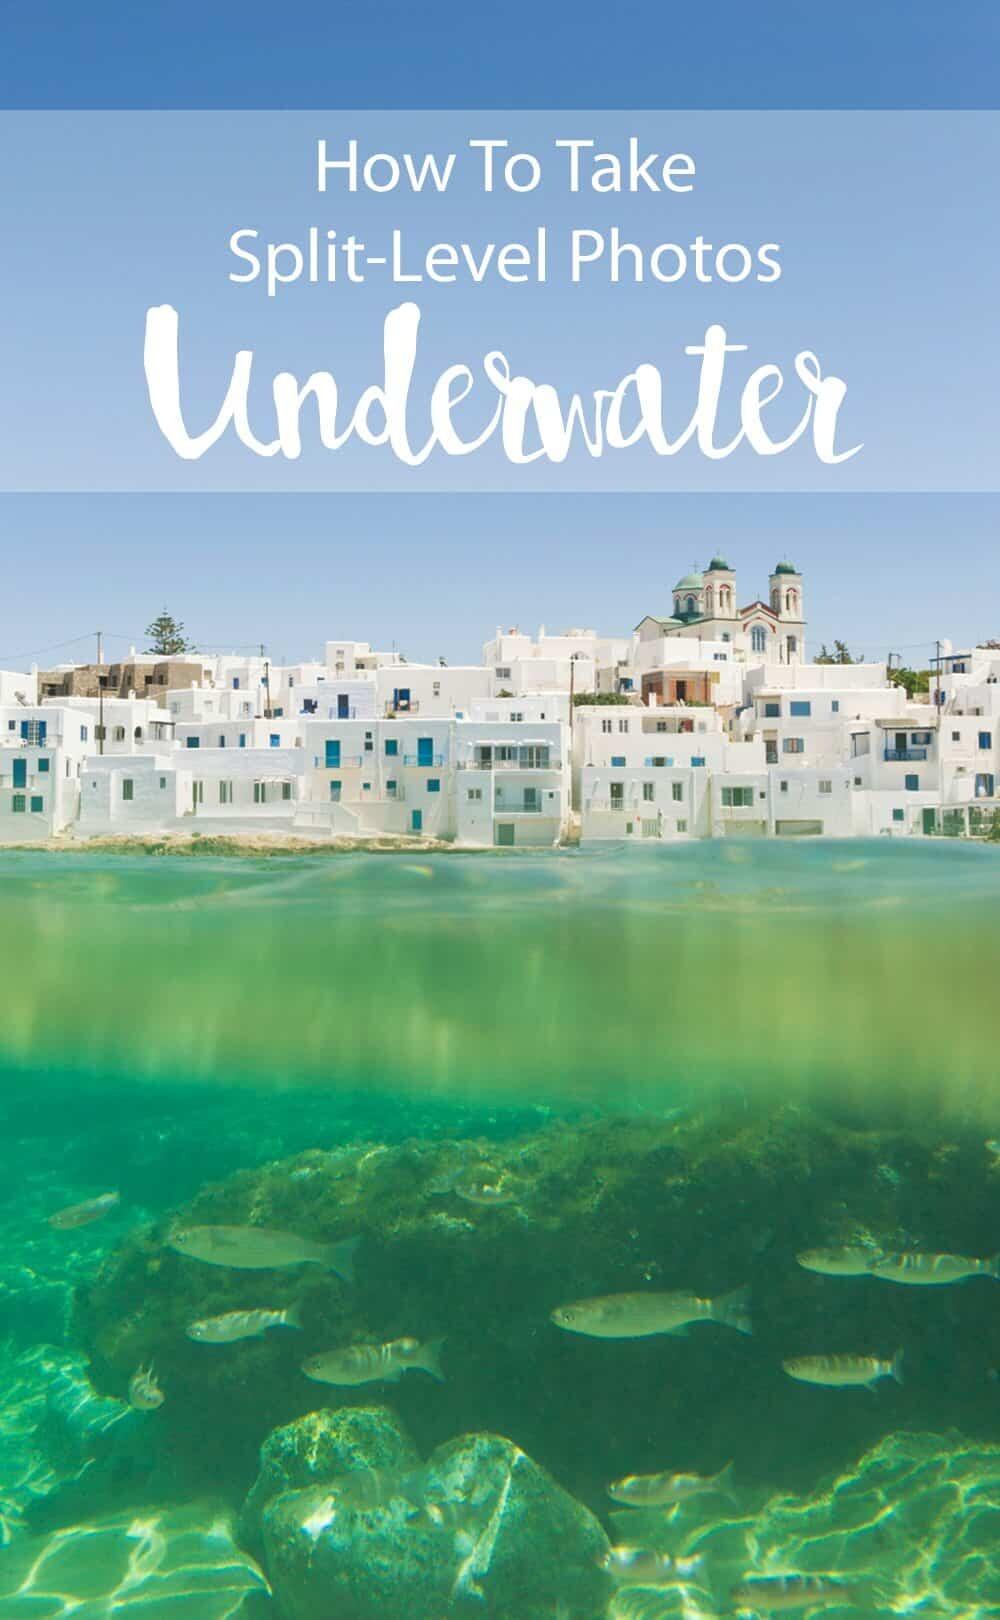 How to Take Underwater Split Level Photos